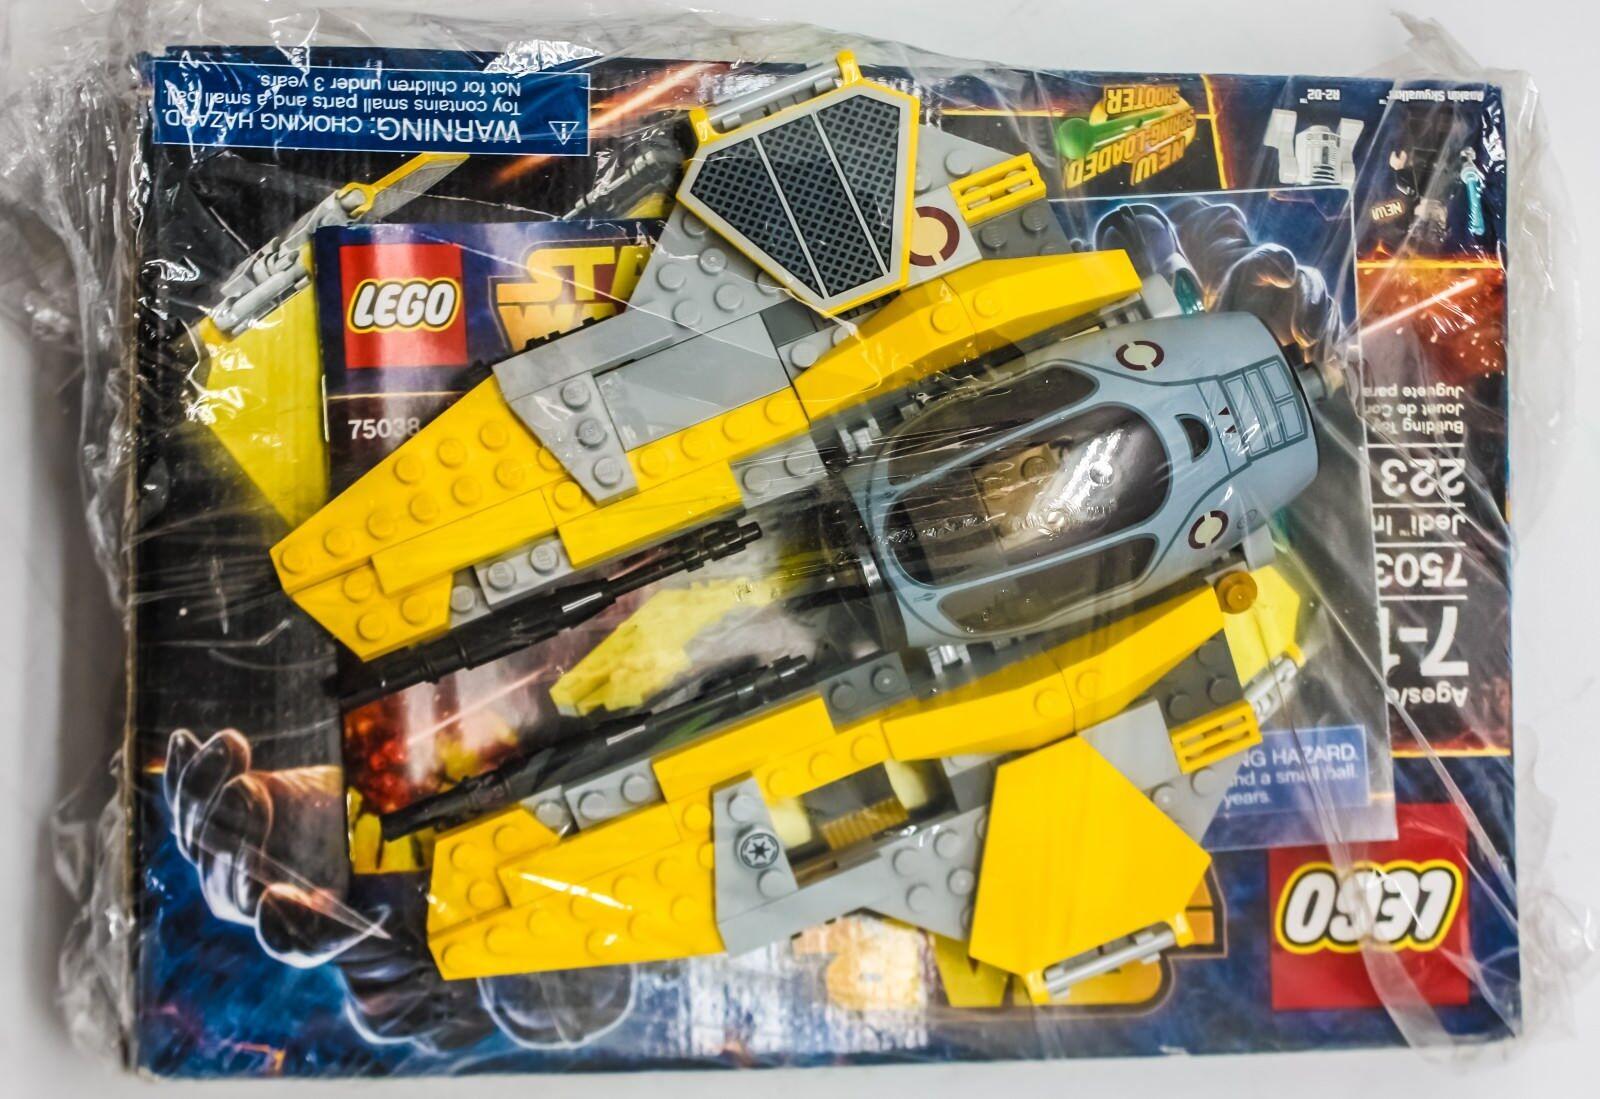 Lego Star Wars Jedi Interceptor (75038) La venganza de los Sith episodio 3 Build Juguete